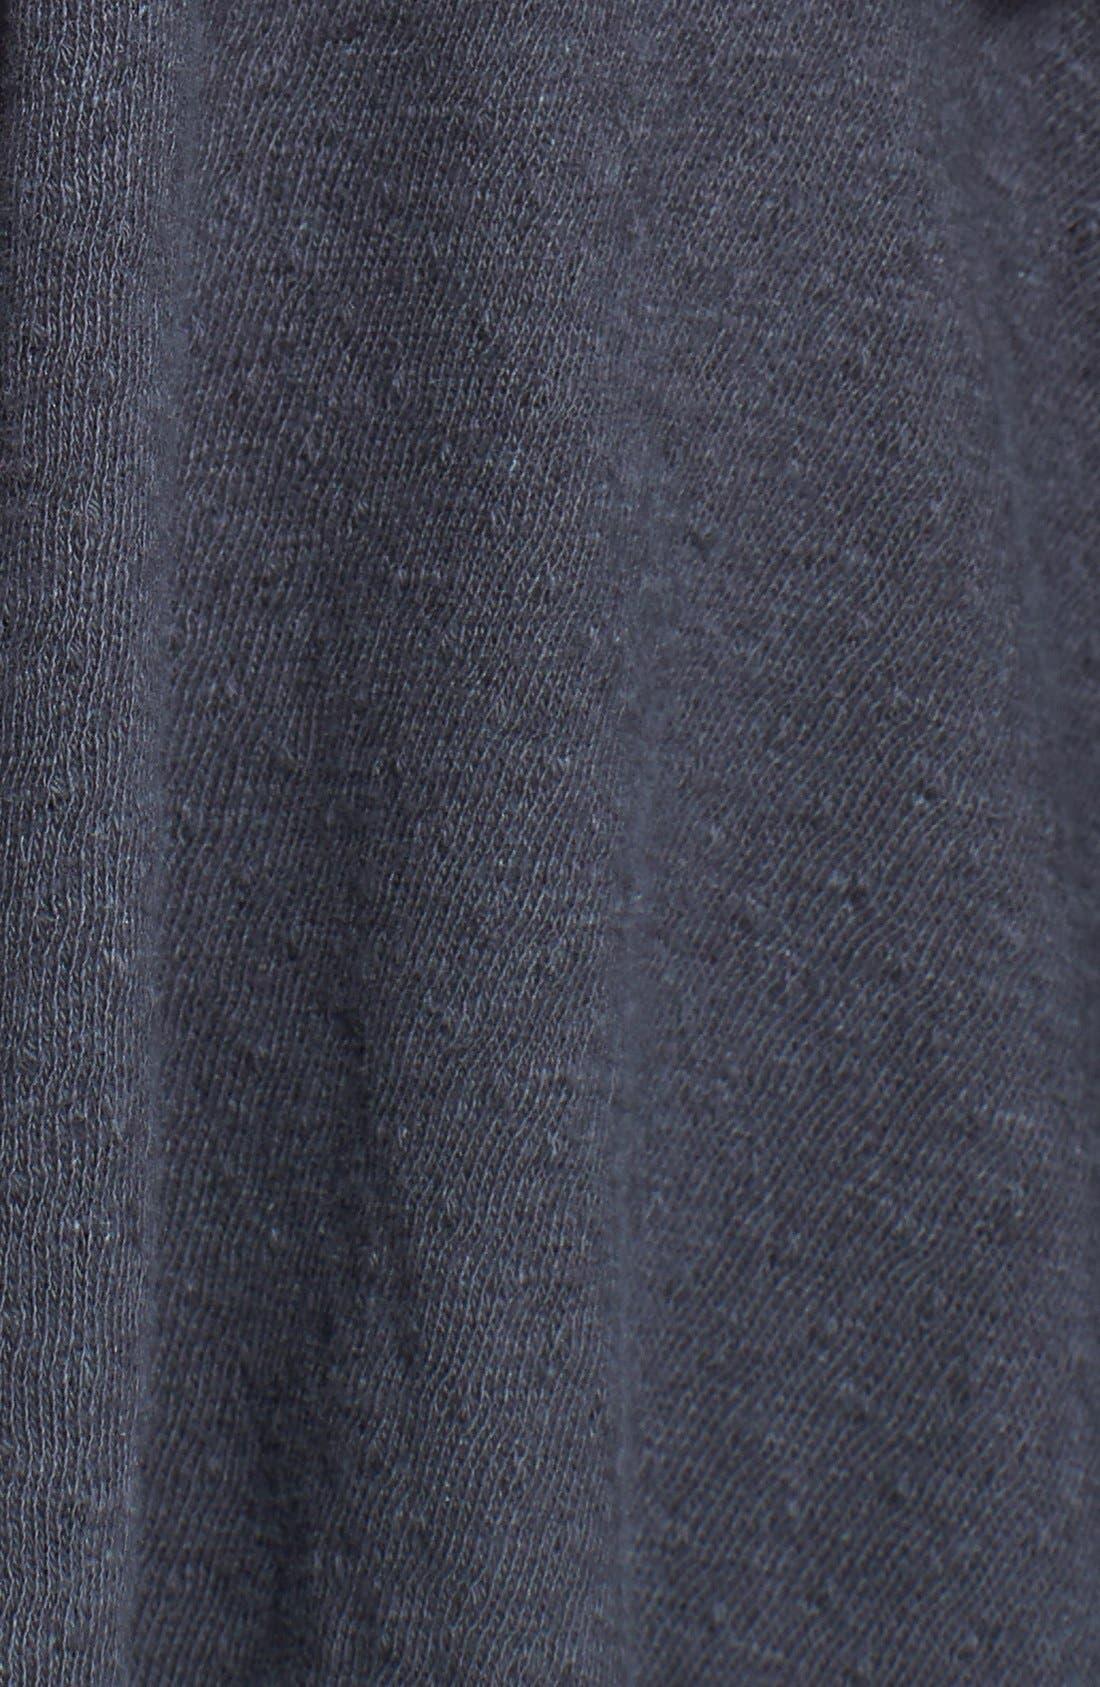 Alternate Image 3  - Free People 'Run Around' Eyelet Linen & Cotton Top